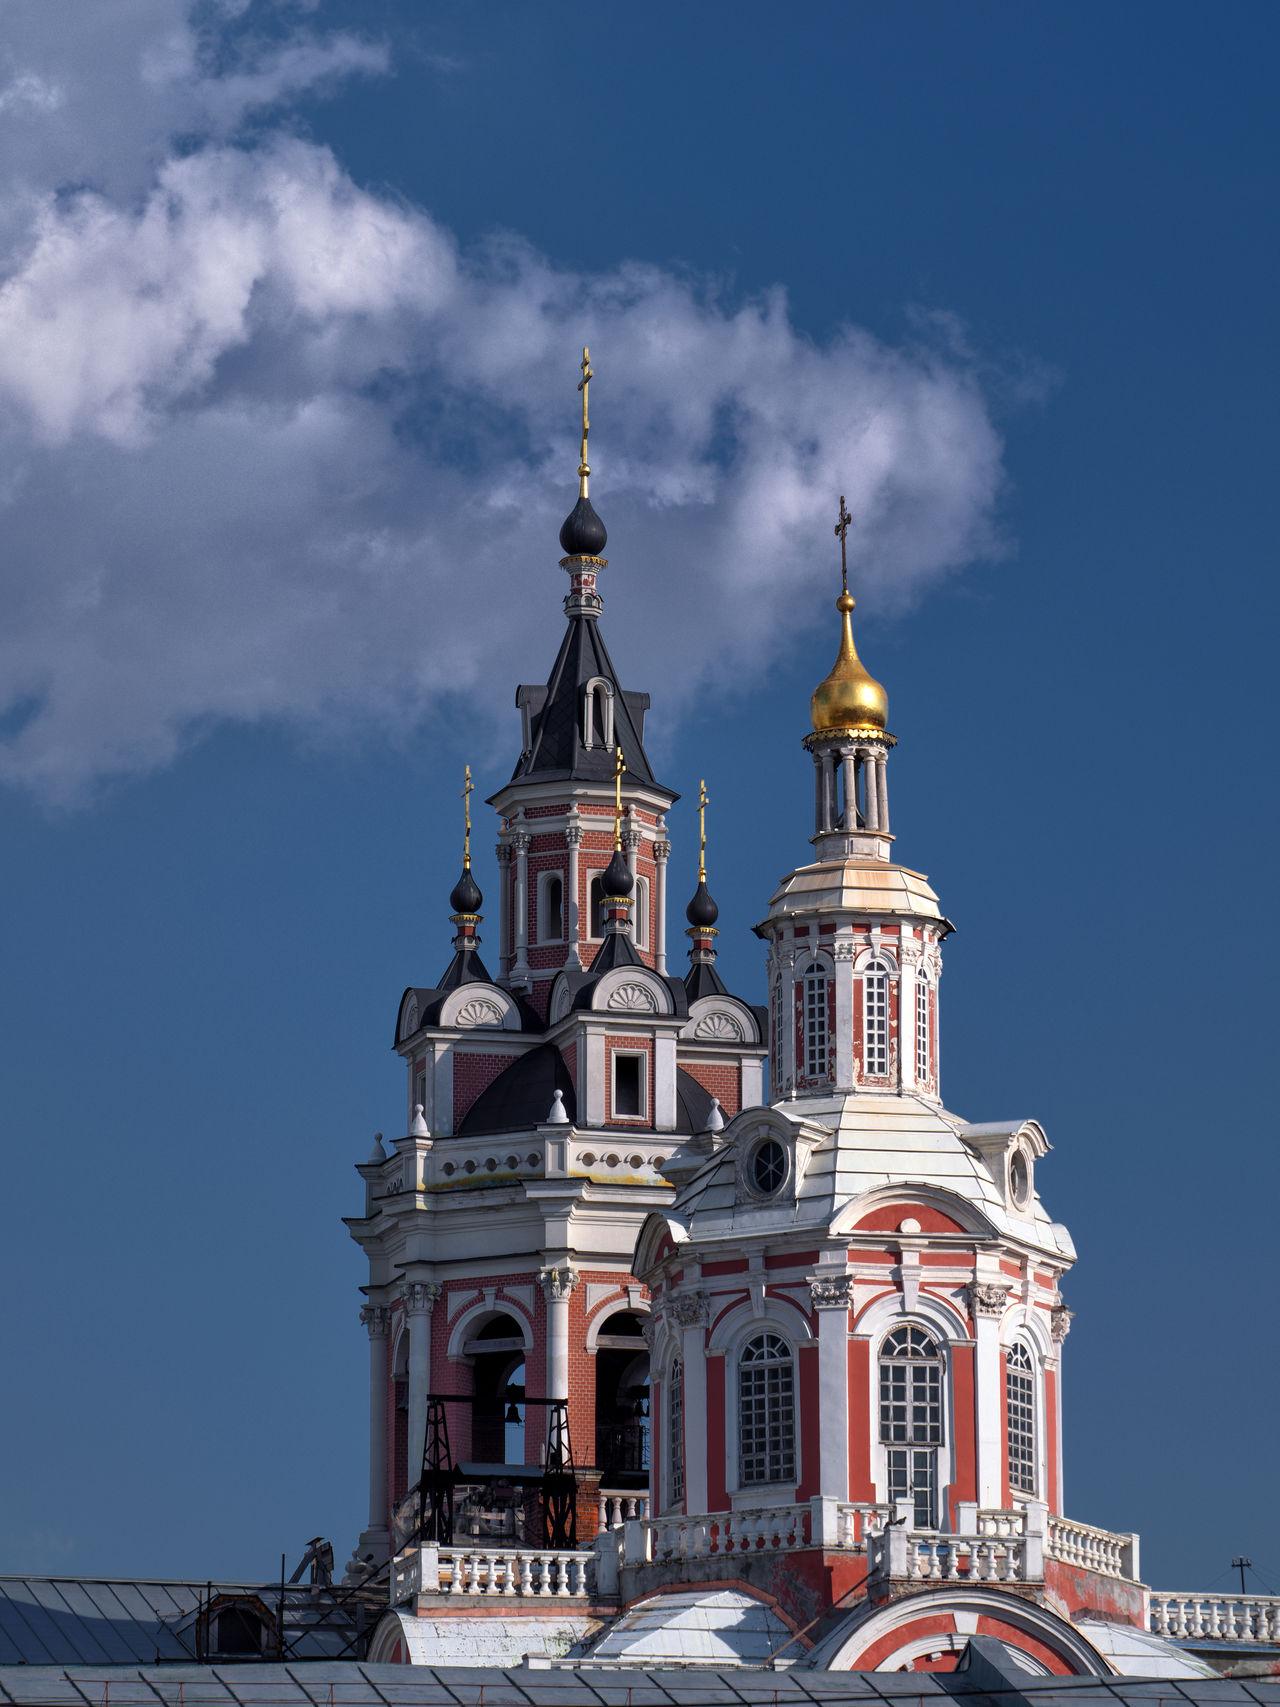 The Cathedral of the Holy Savior's image, Russia, Moscow, Nikolskaya street, Church, faith Church Churchhh. Moscow Nikolskaya Street Russia Summer The Cathedral Of The Holy Savior's Image Tourism Vacation